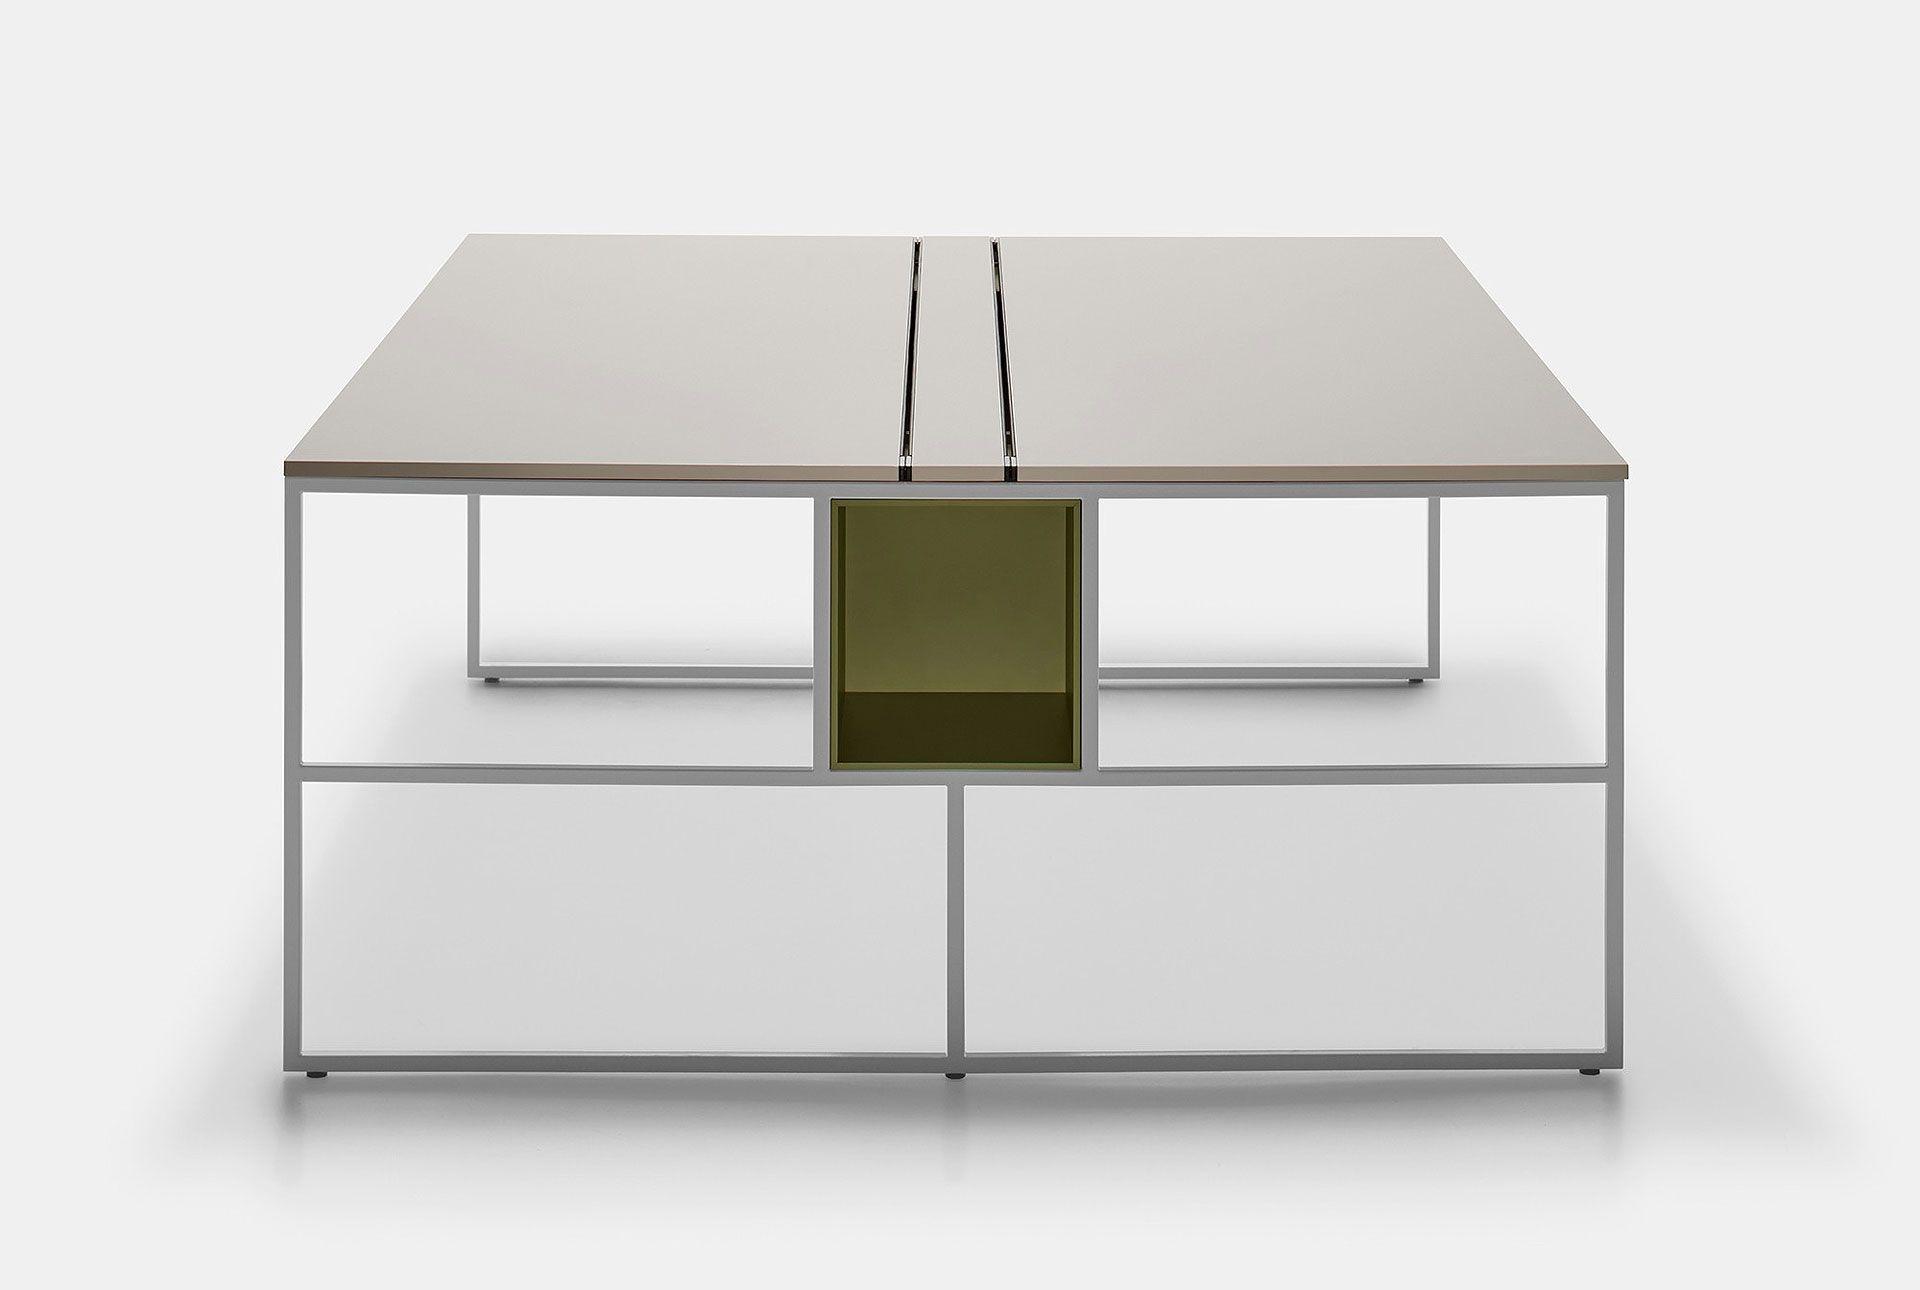 Italian Luxury Furniture Designer Furniture Singapore Da Vinci Lifestyle Office Desk Designs Mdf Italia Sleek Desk [ 1290 x 1920 Pixel ]